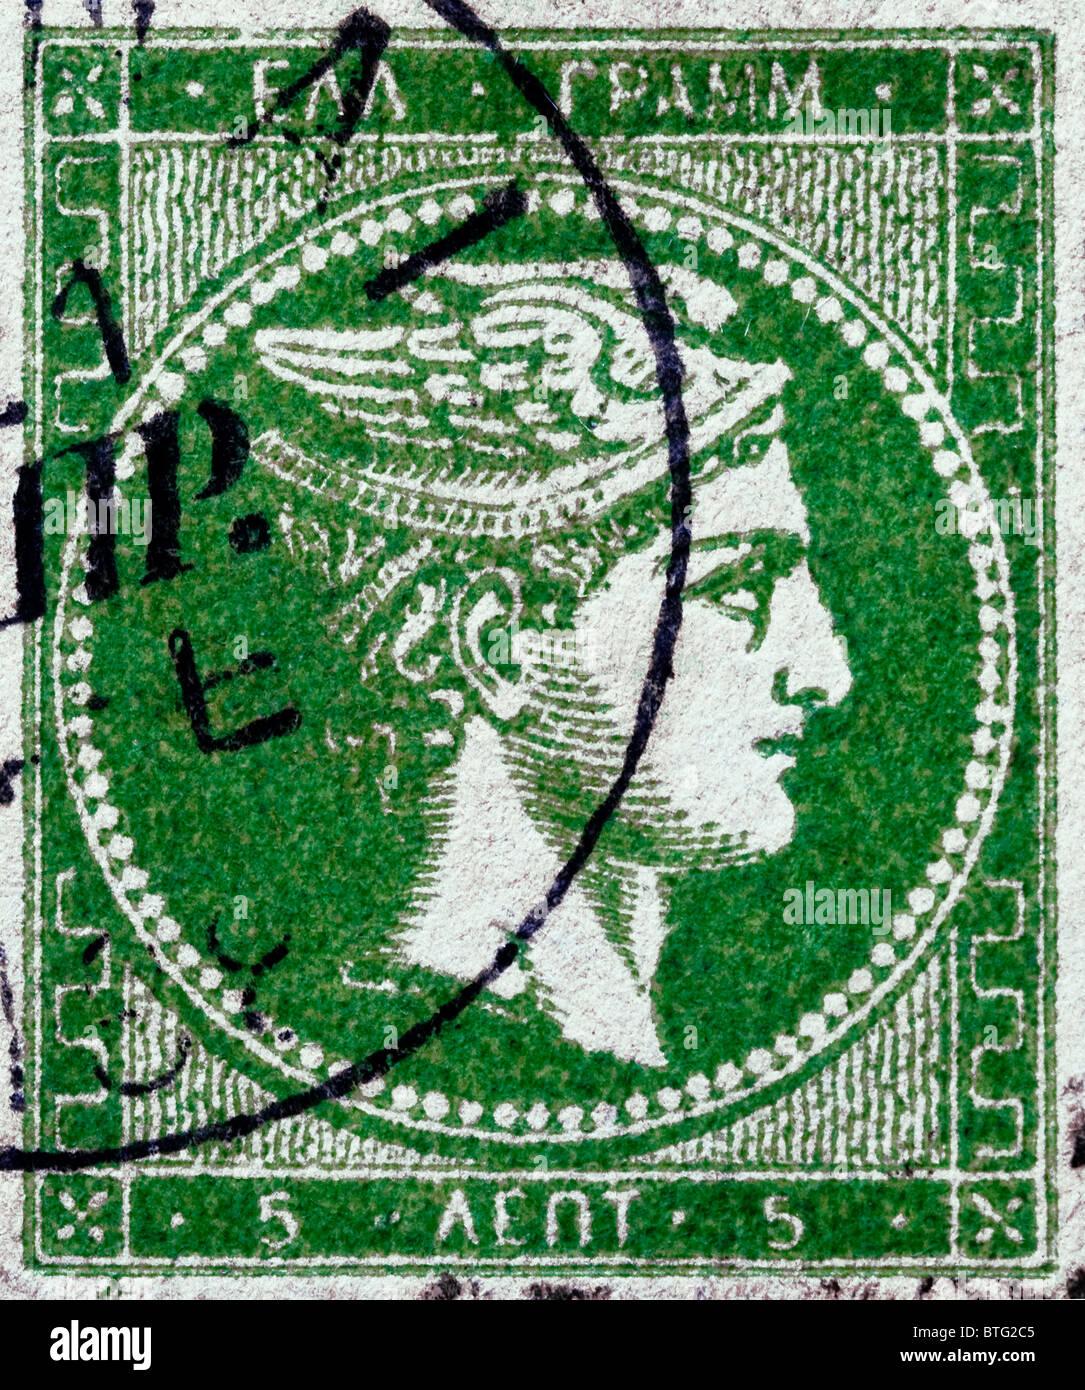 Used 1861-1882 Greek 5 lepta 'Large Hermes Head' definitive postage stamp. - Stock Image